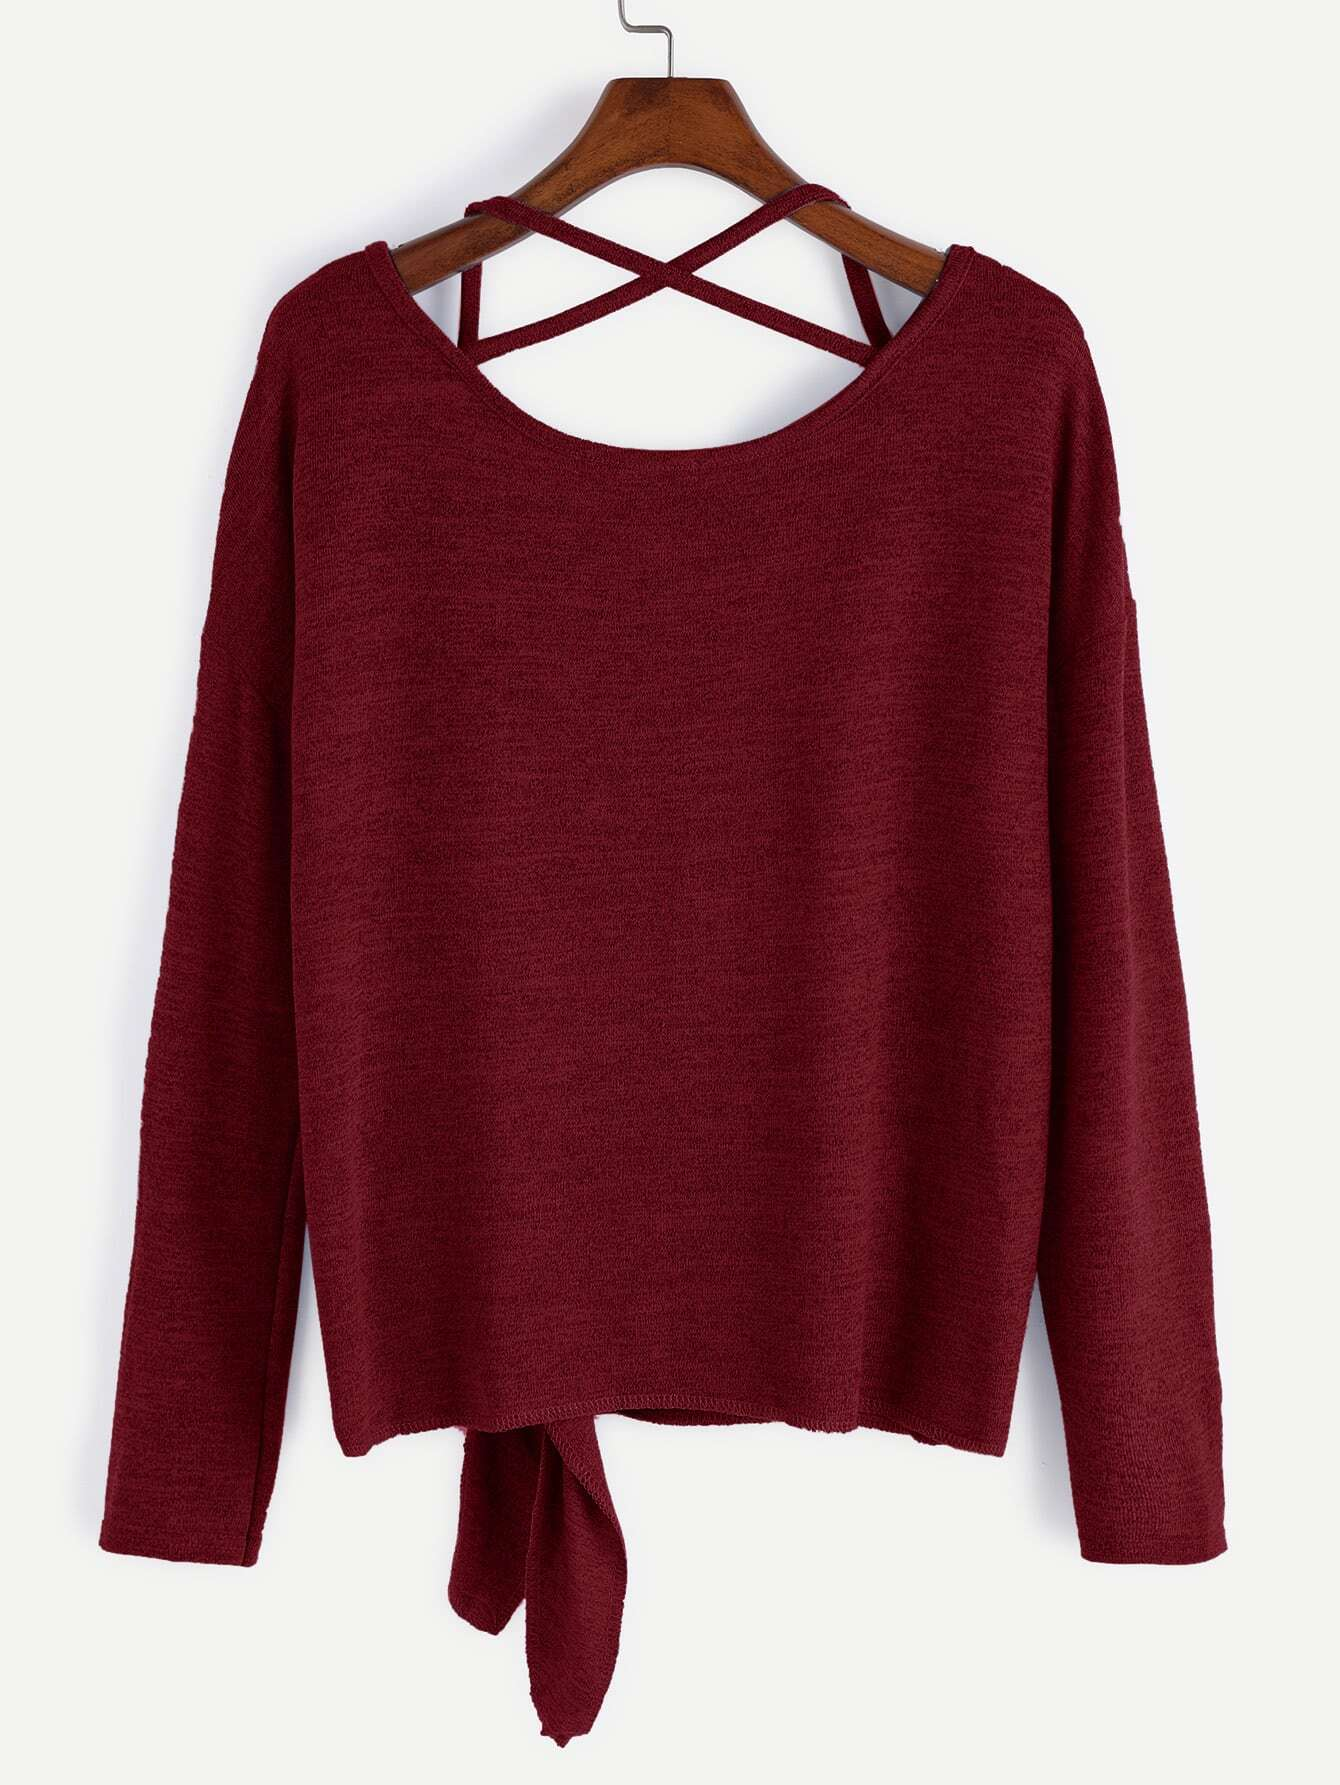 Burgundy Drop Shoulder Criss Cross Tie Front T-Shirt